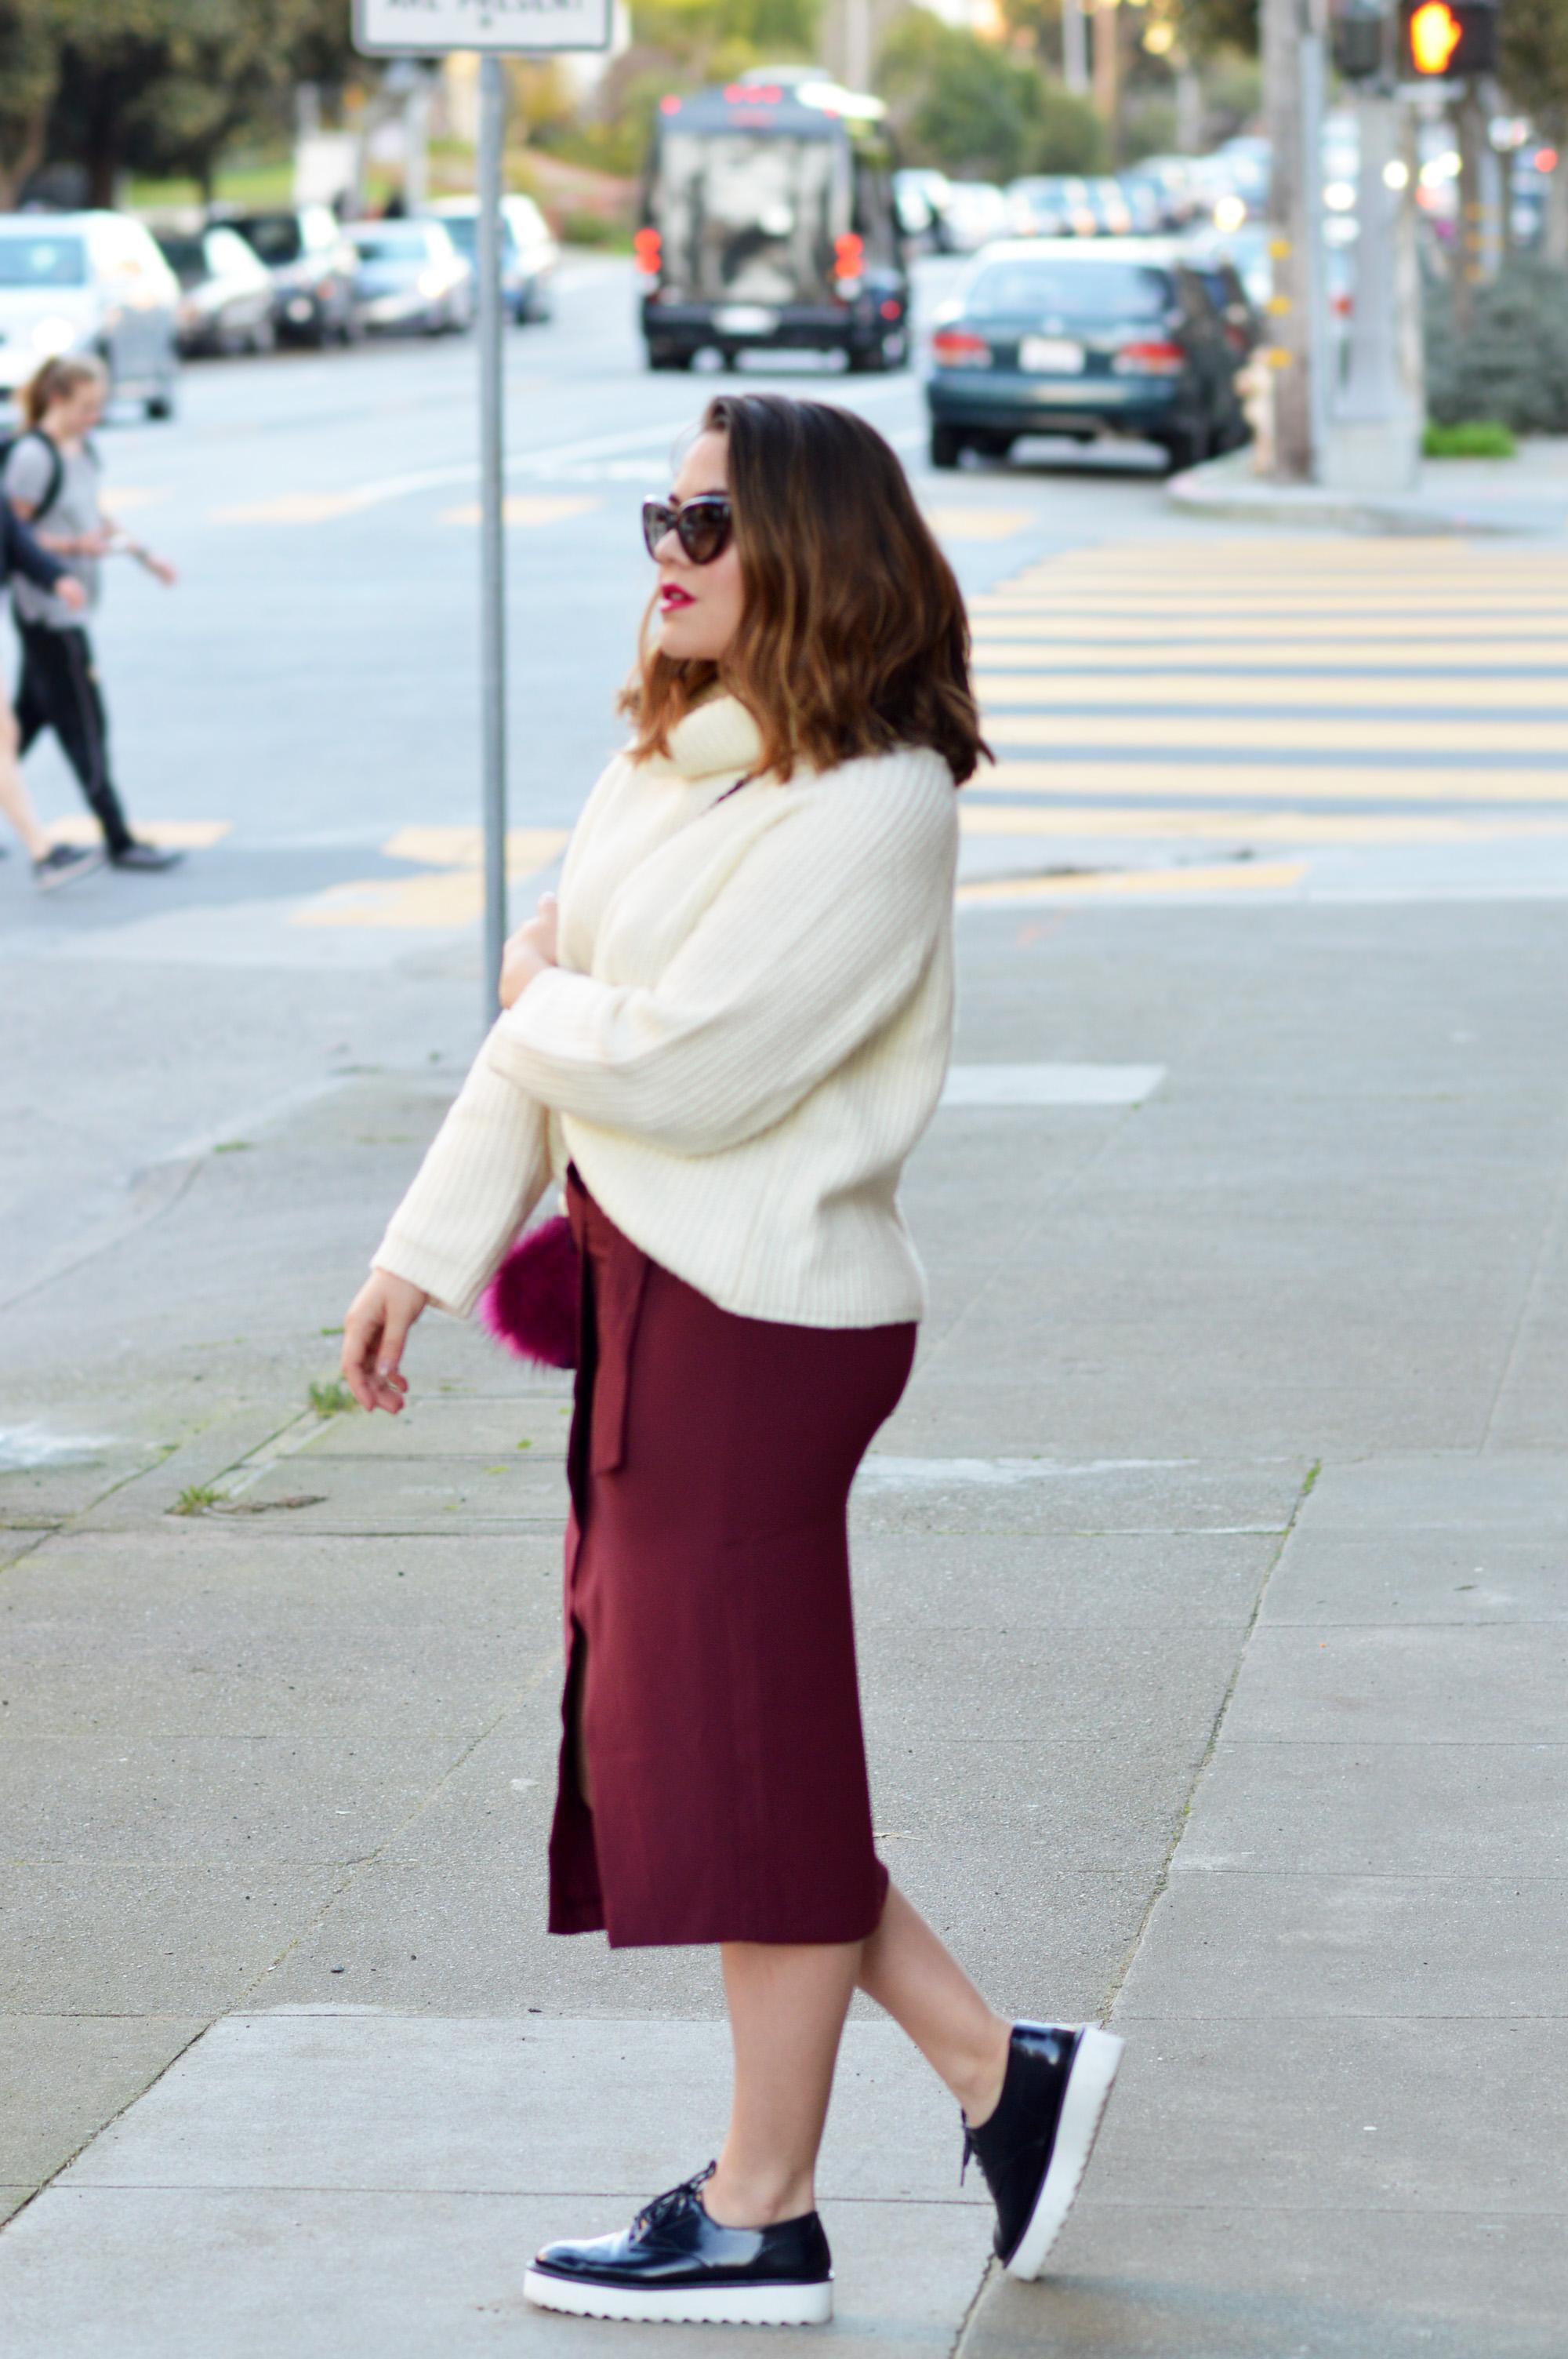 Colors of the Season, Maroon Skirt and Oversized Sweater via. www.birdieshoots.com